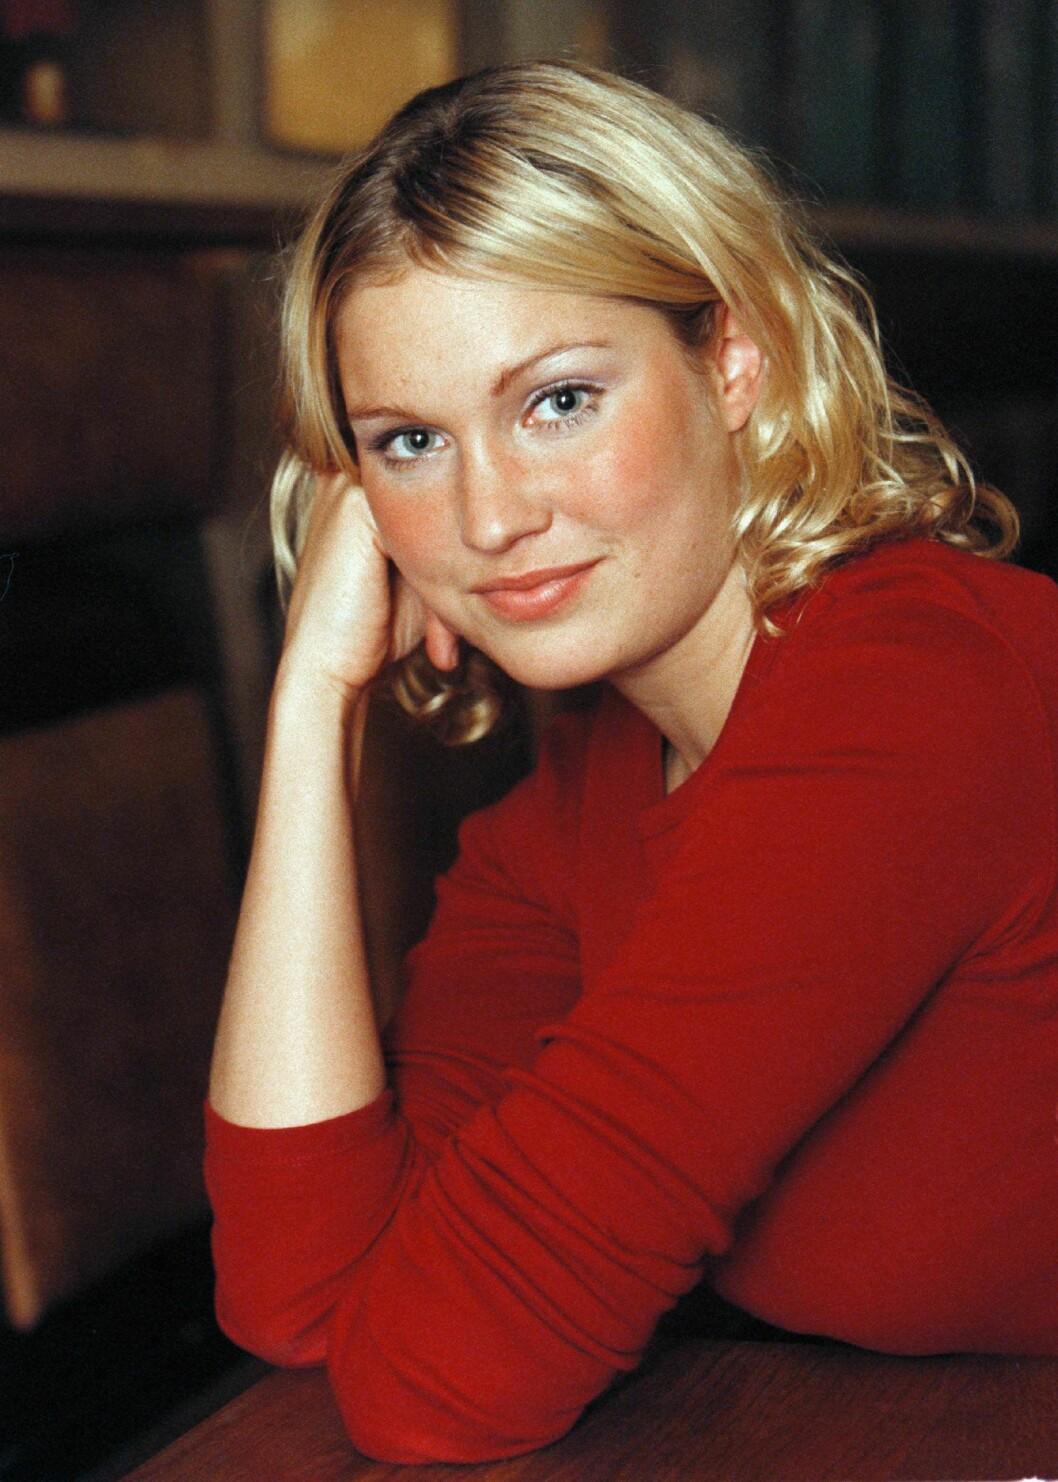 Jessica Almenäs ung